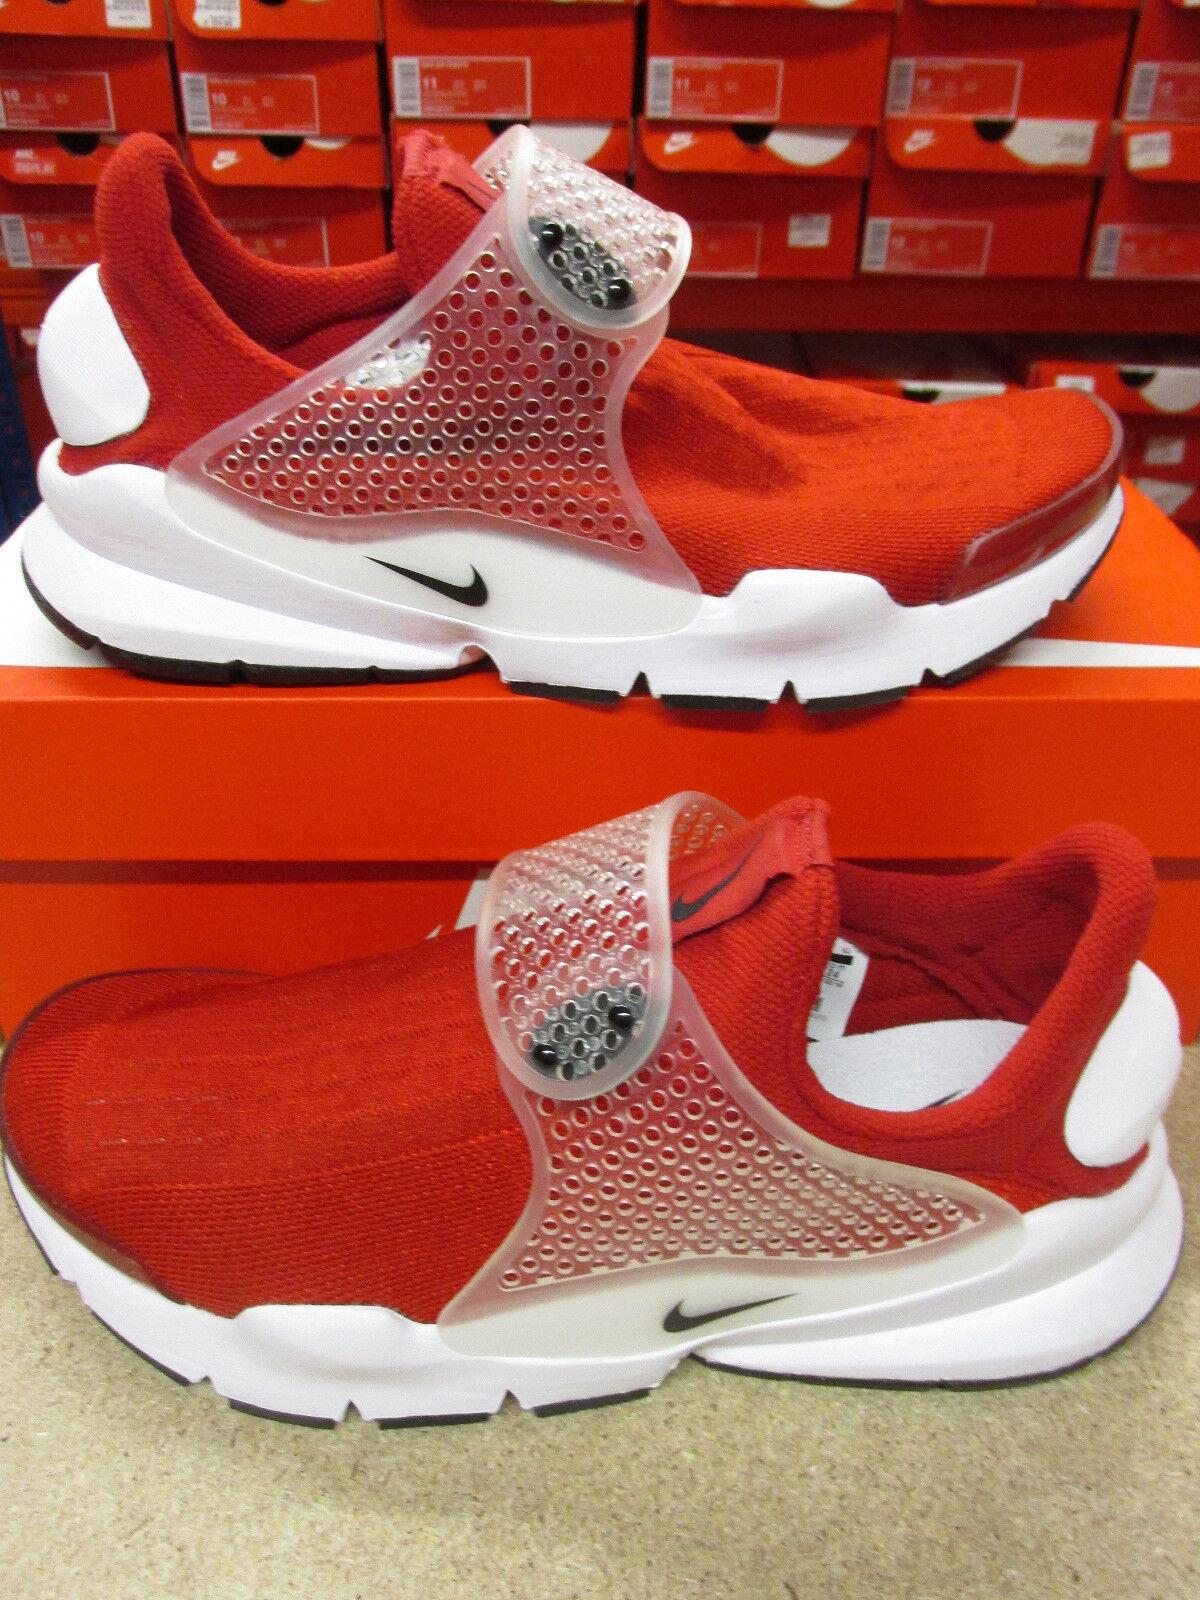 Nike Sock Dart Mens Running Trainers 819686 601 Sneakers Shoes